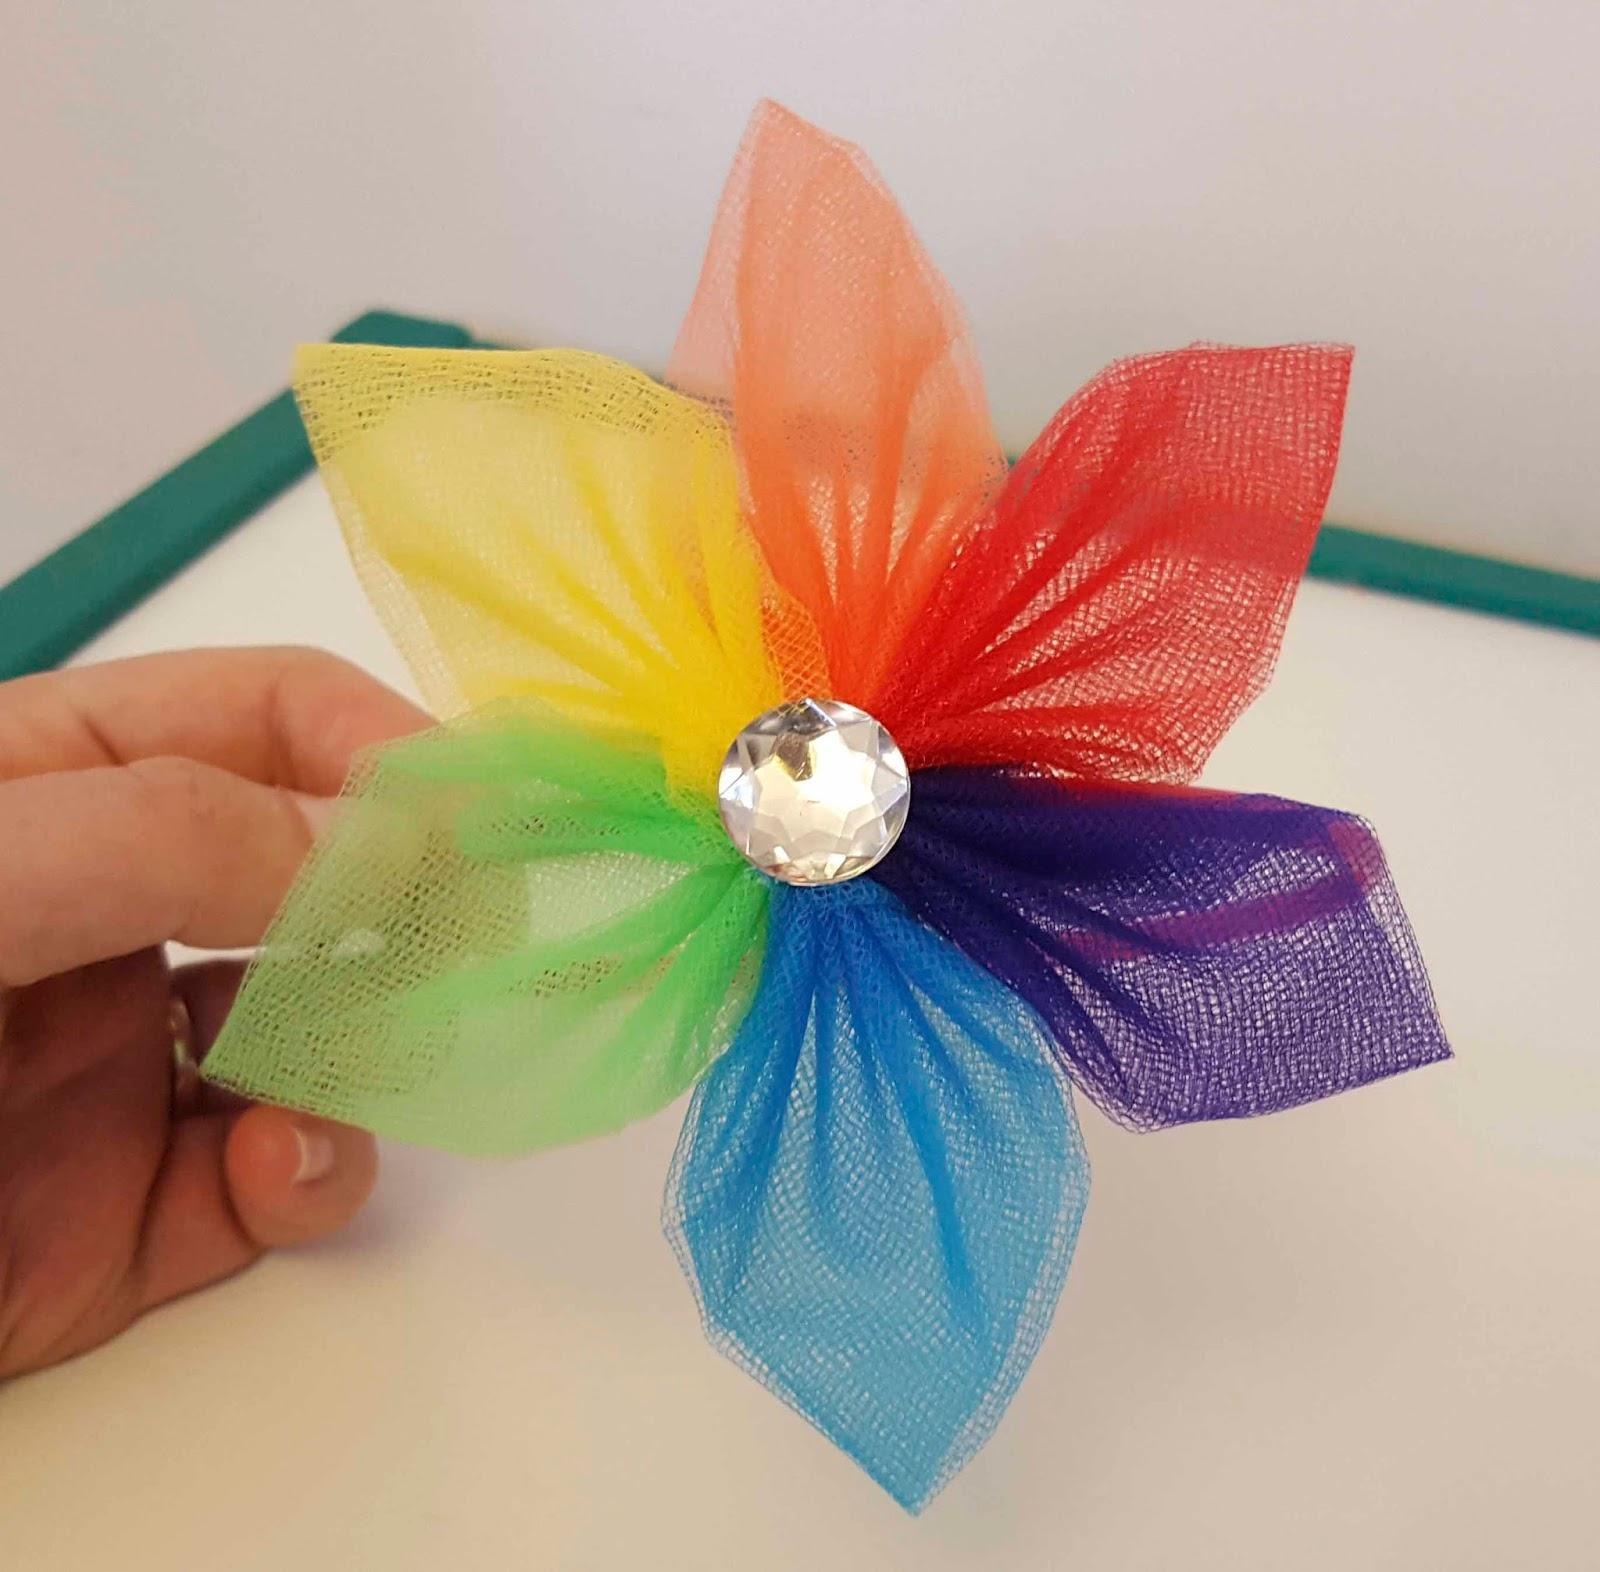 ChemKnits  Pride Headband - DIY Rainbow Tulle Flower 6be97aa6c36